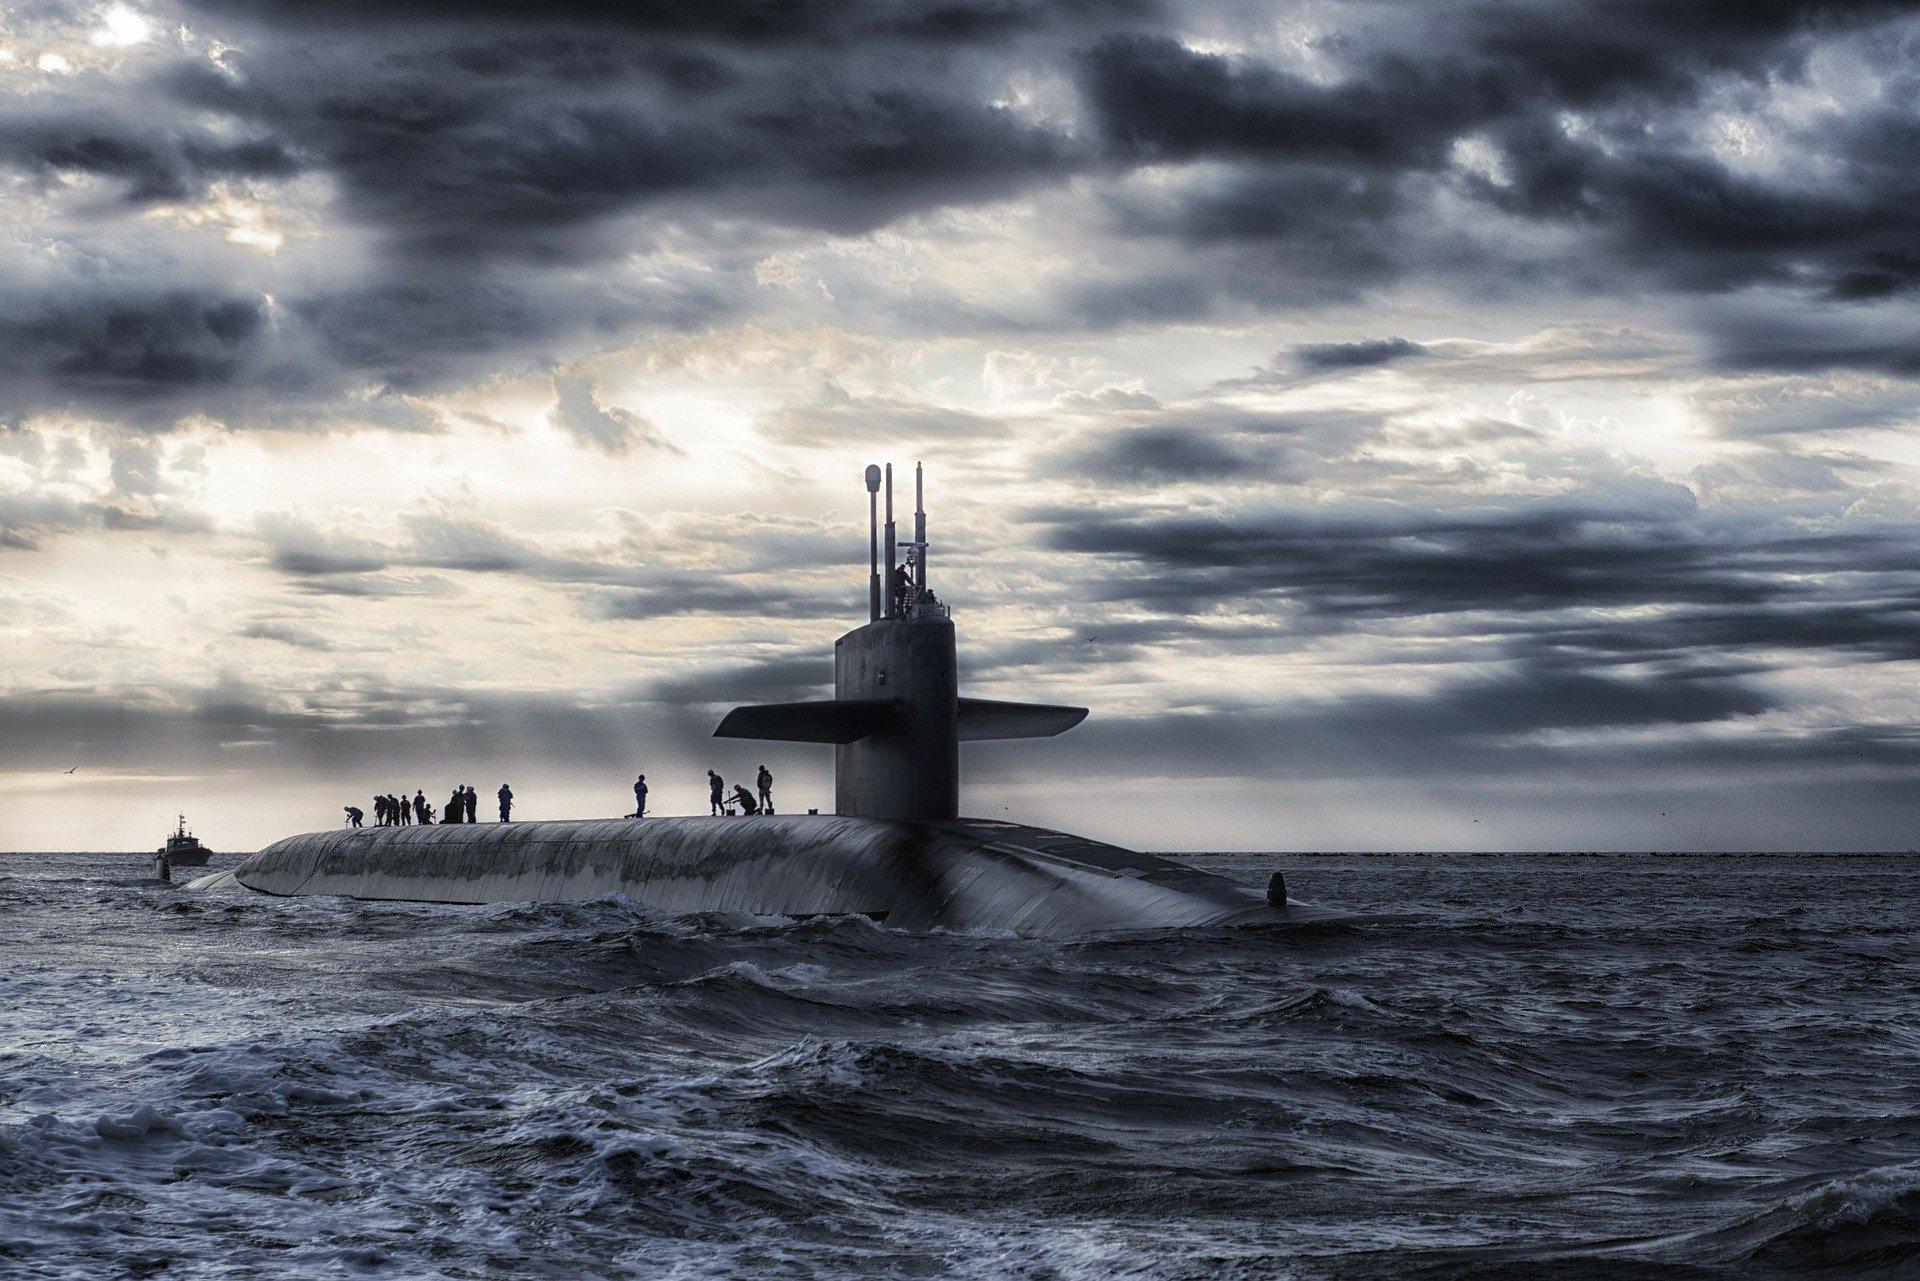 submarine-168884_1920